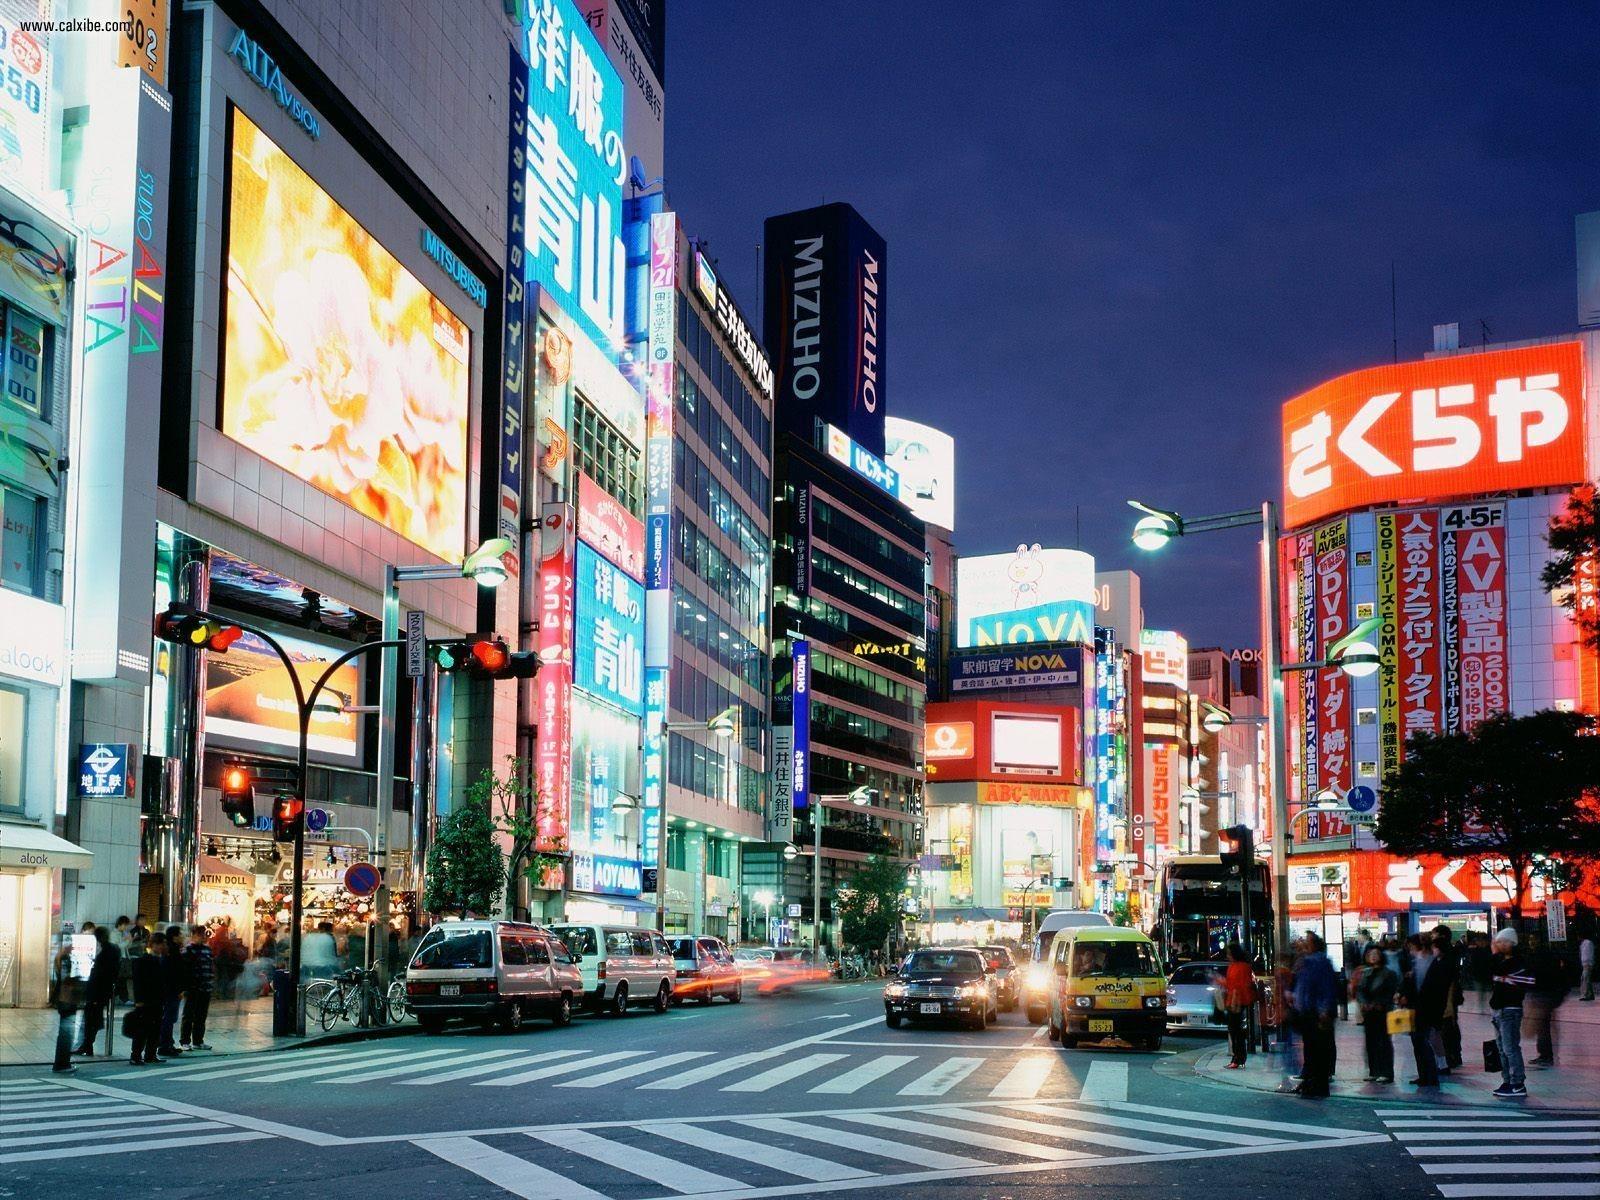 city wallpapers tokyo city wallpapers tokyo city wallpapers tokyo city 1600x1200